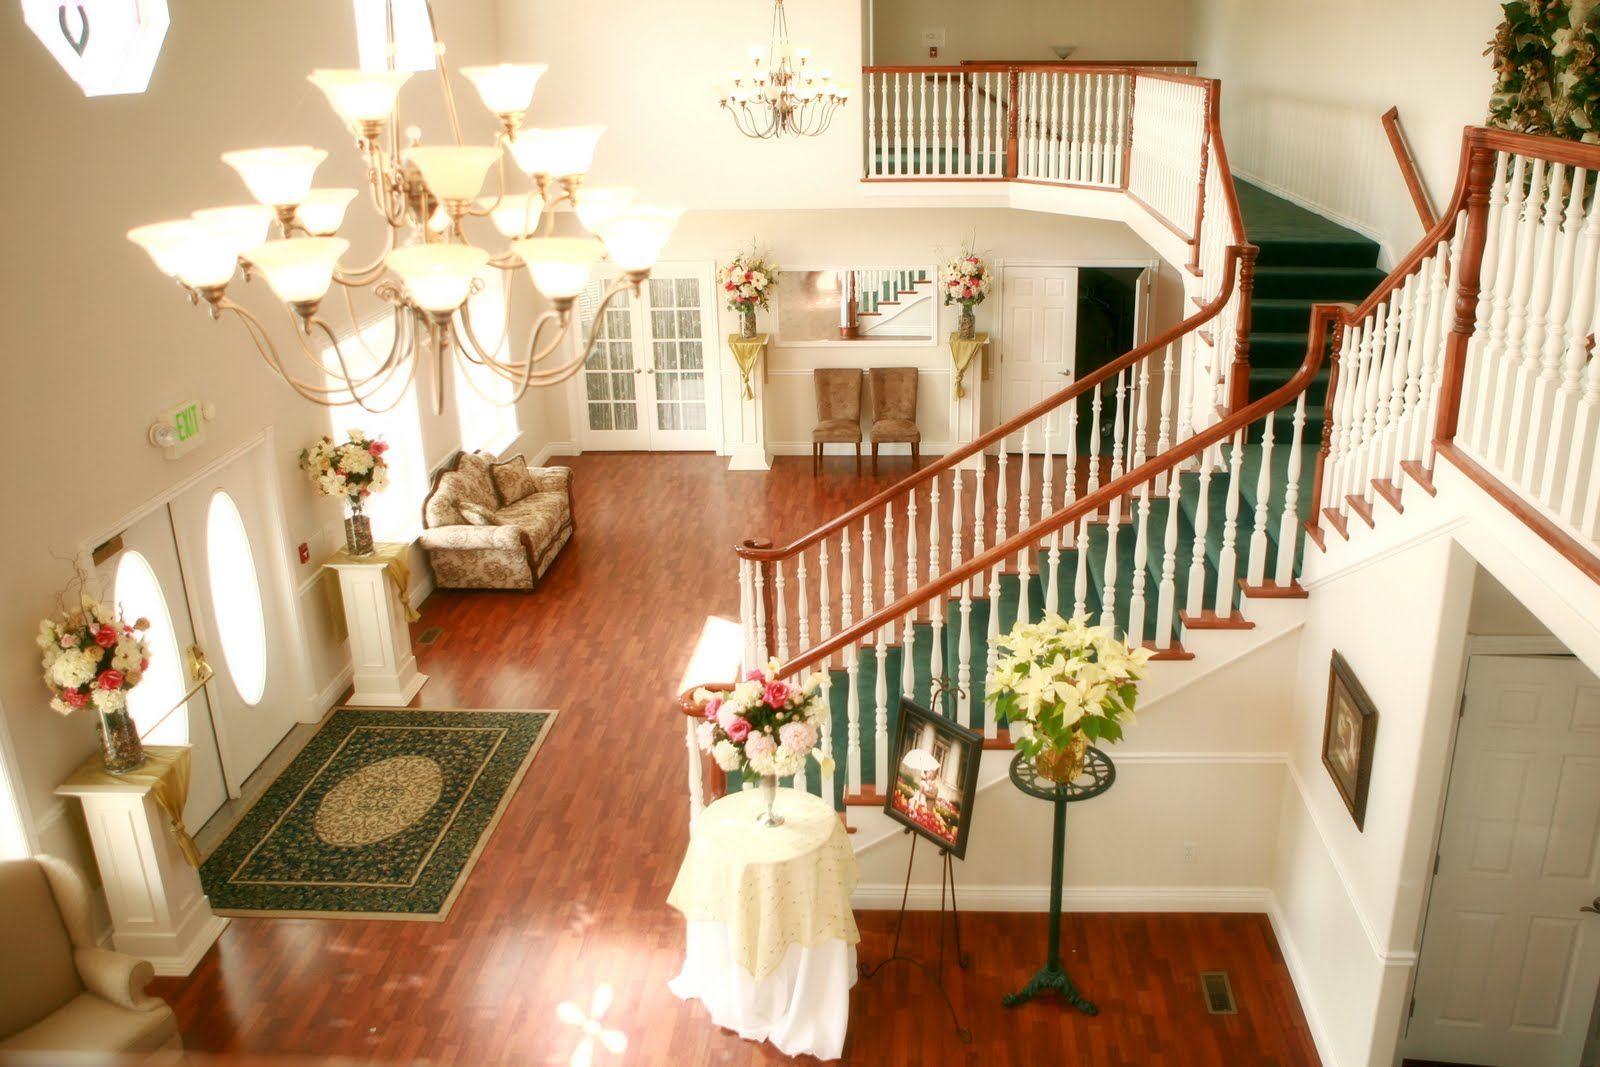 38+ Outdoor wedding locations utah ideas in 2021